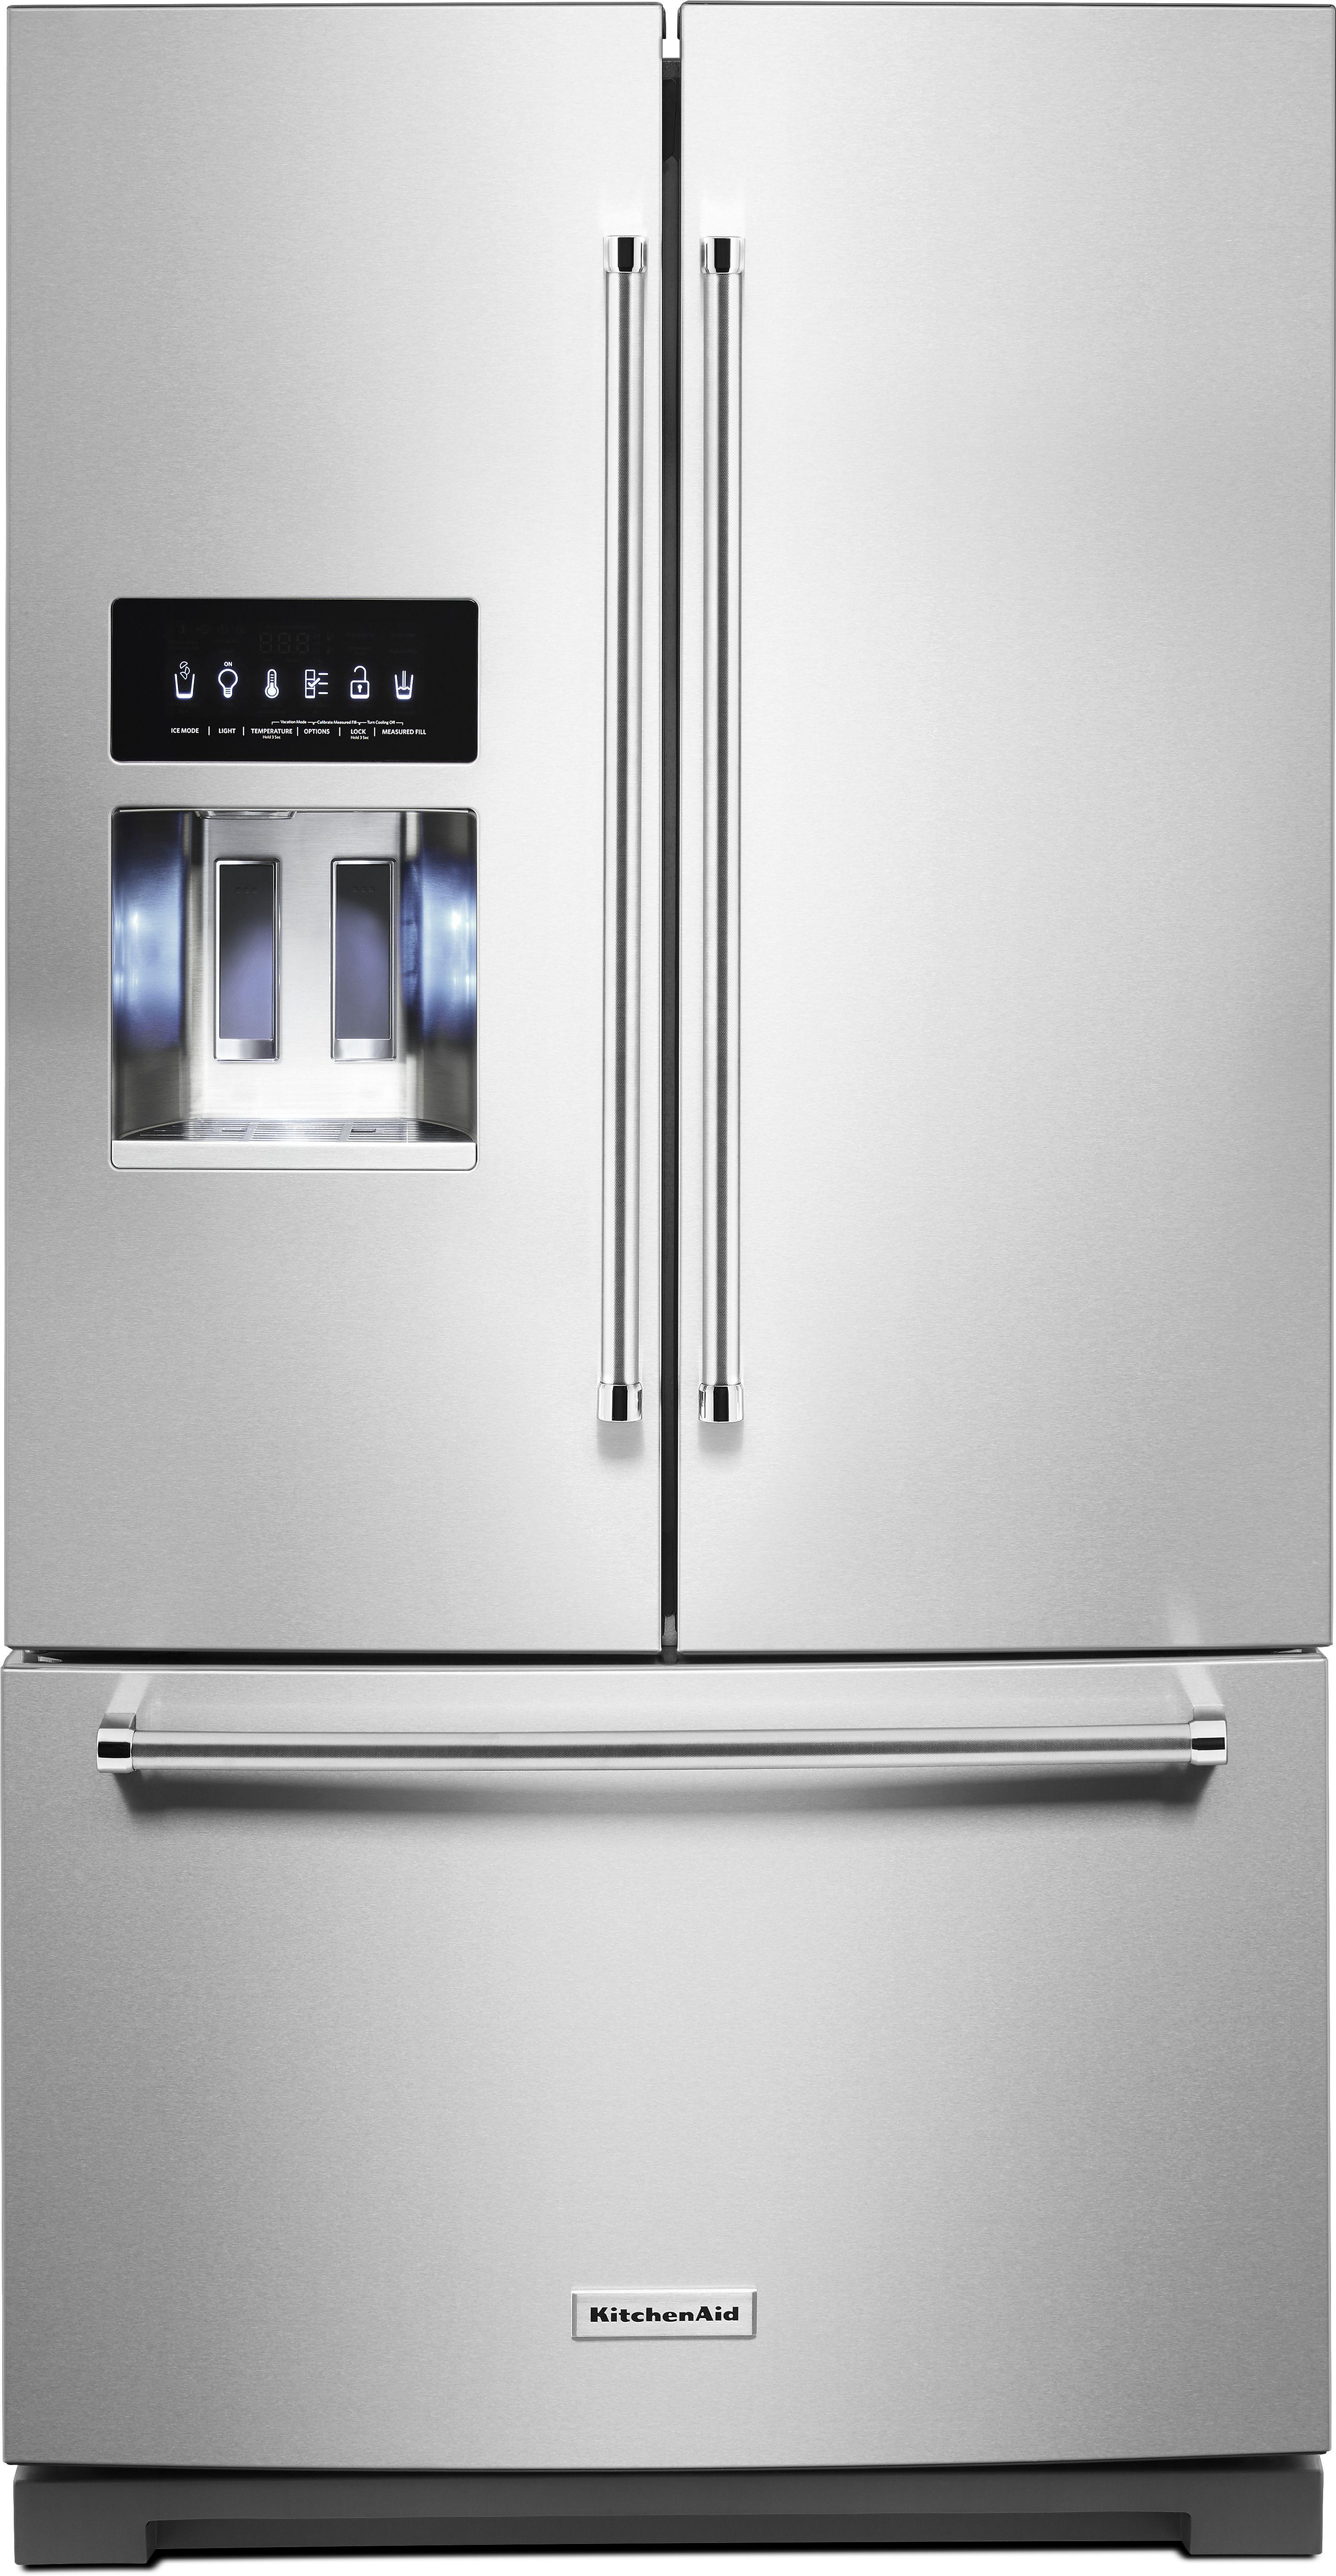 Kitchen Appliances & Appliance Service in Saginaw, MI and